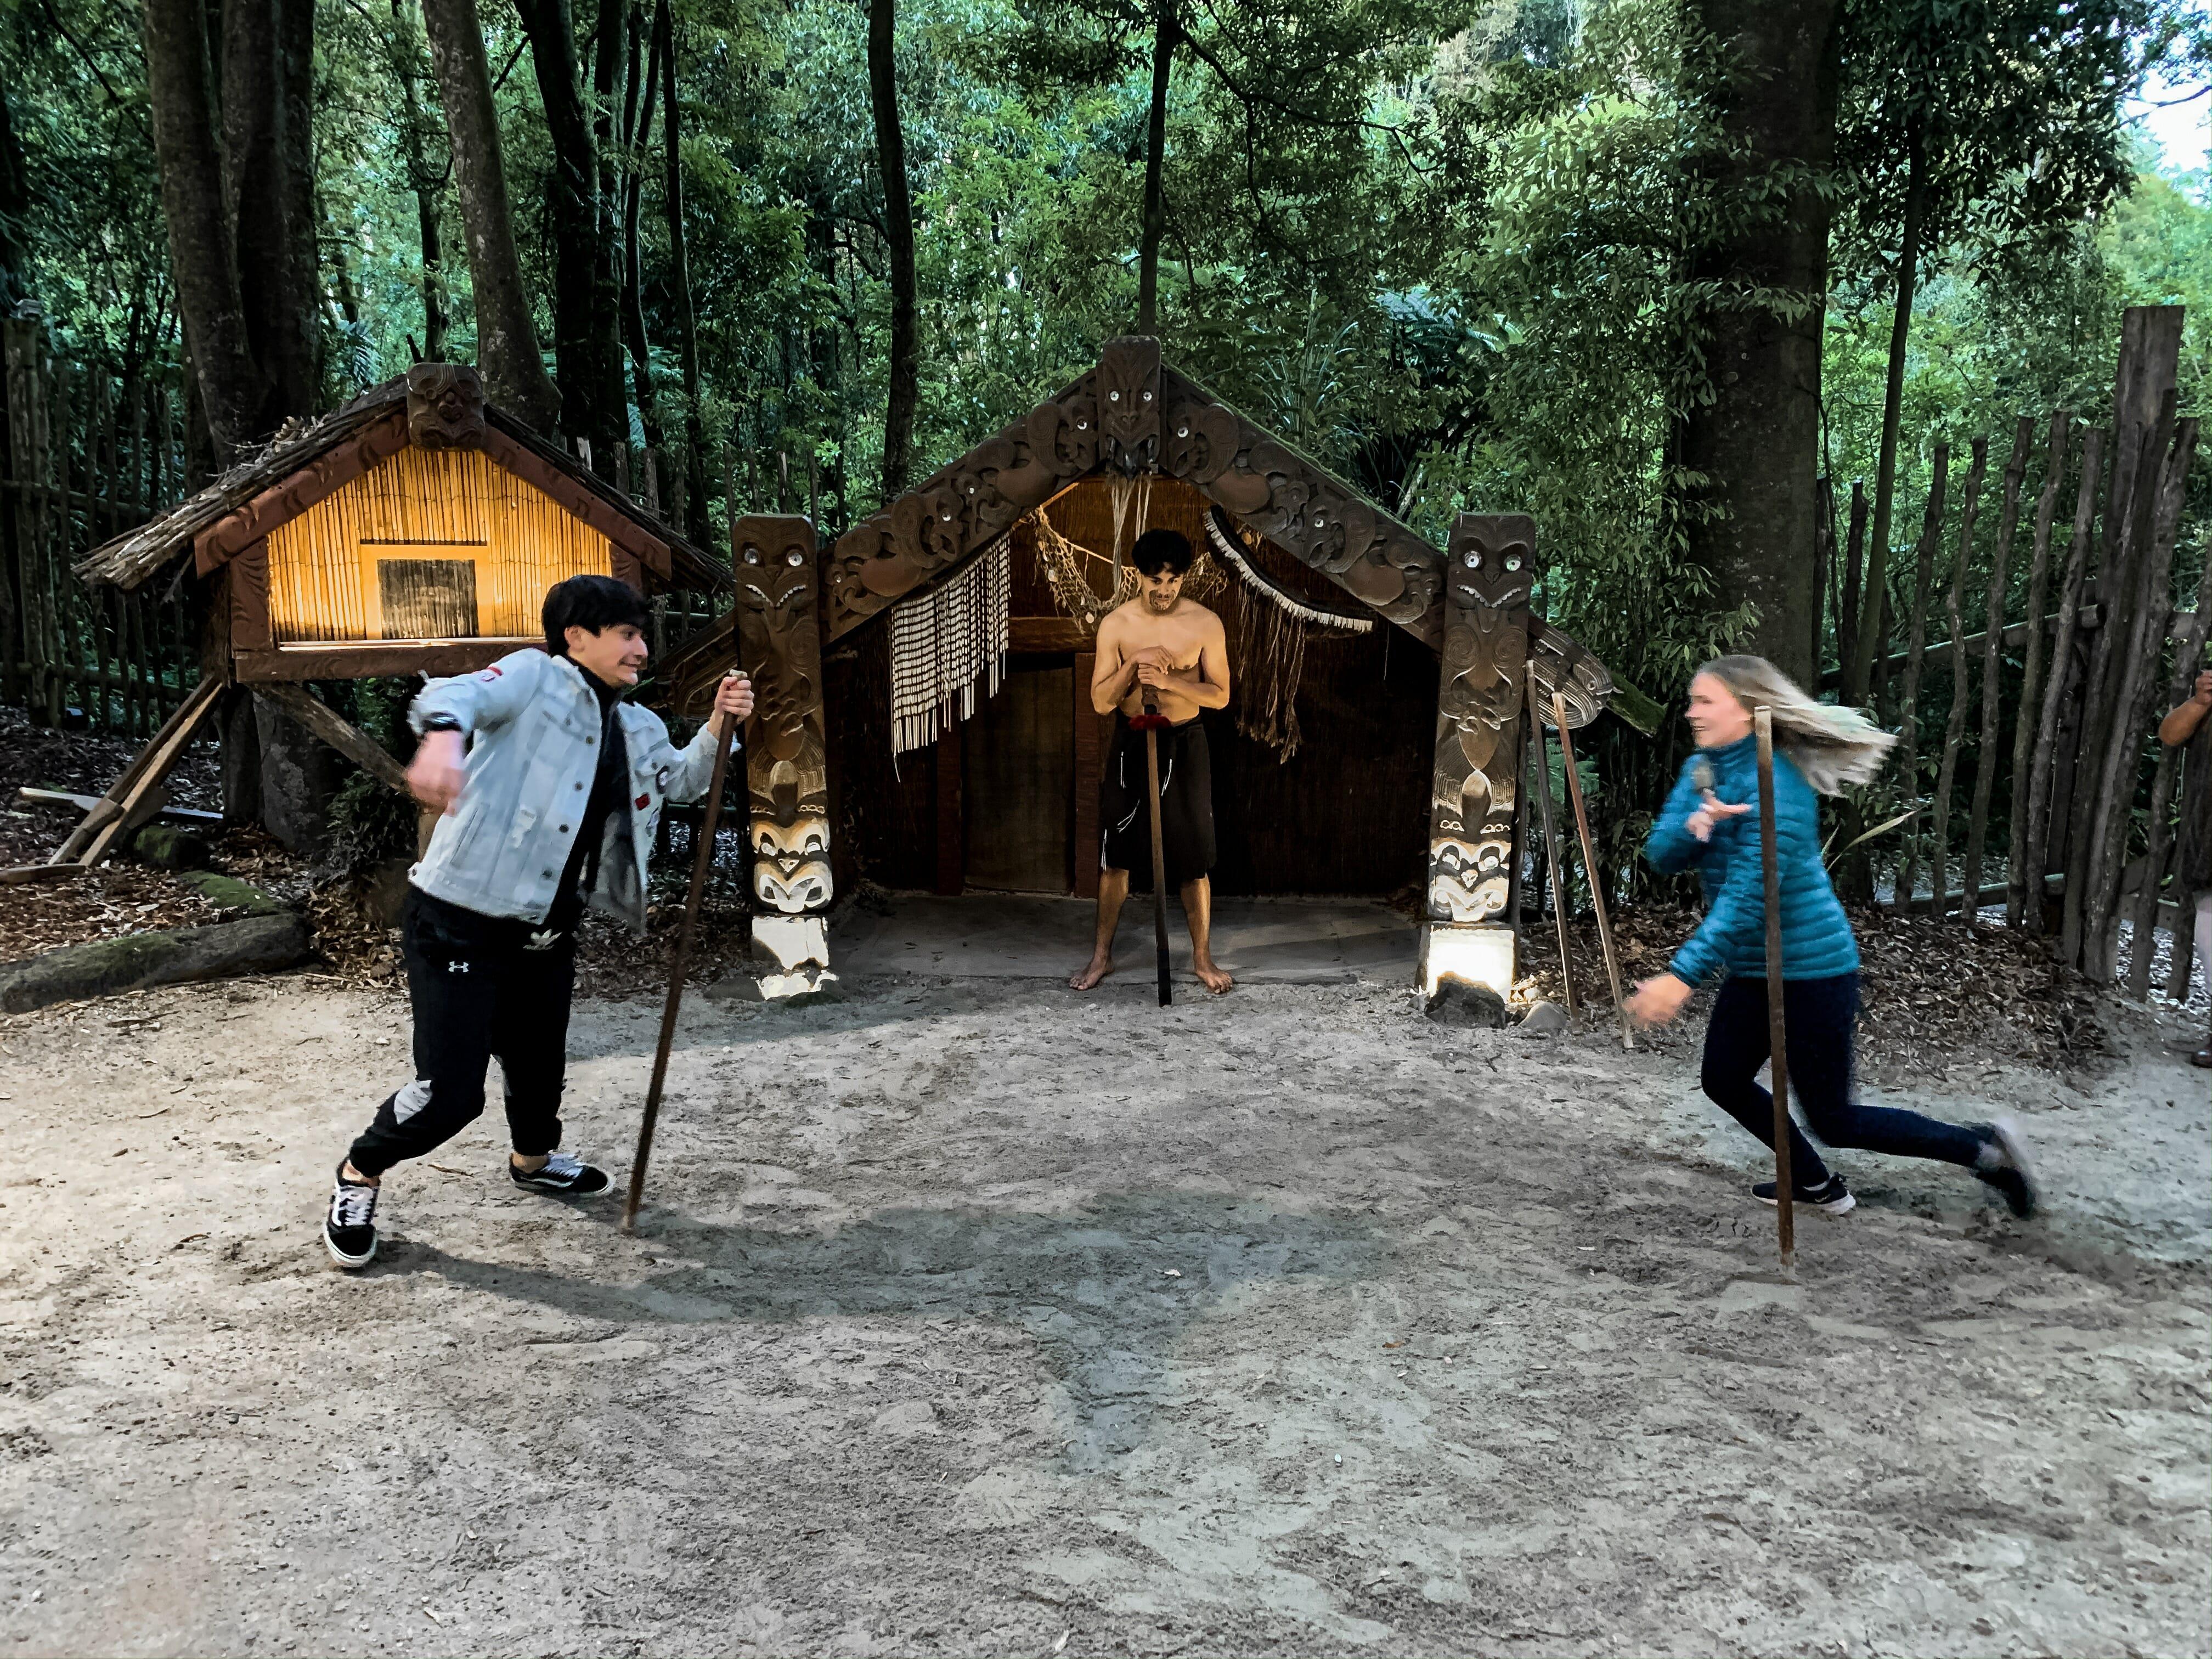 Maori games